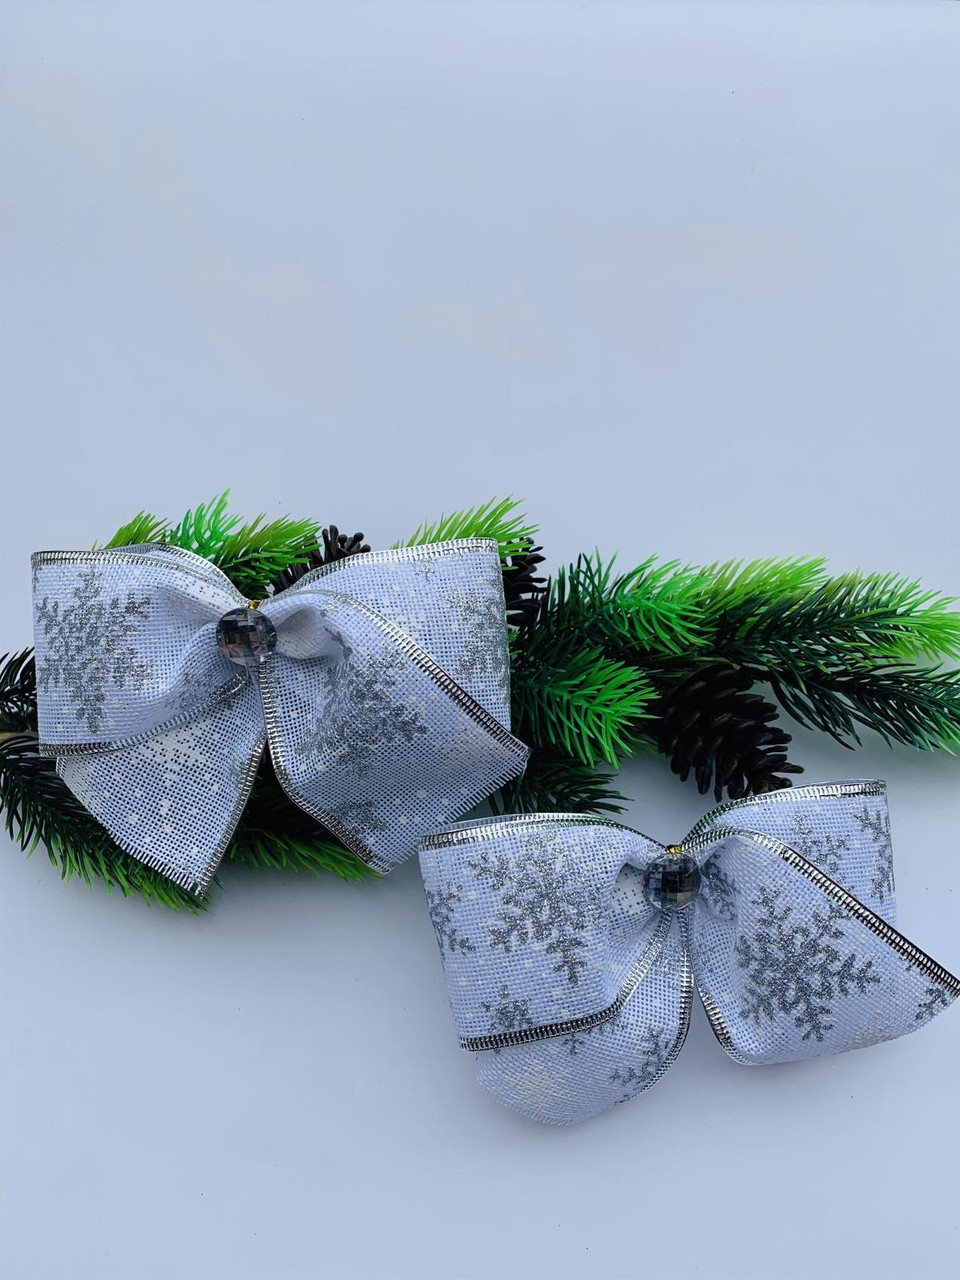 Новогодний декор. Бантик новогодний белый(15 см)(10 штук)